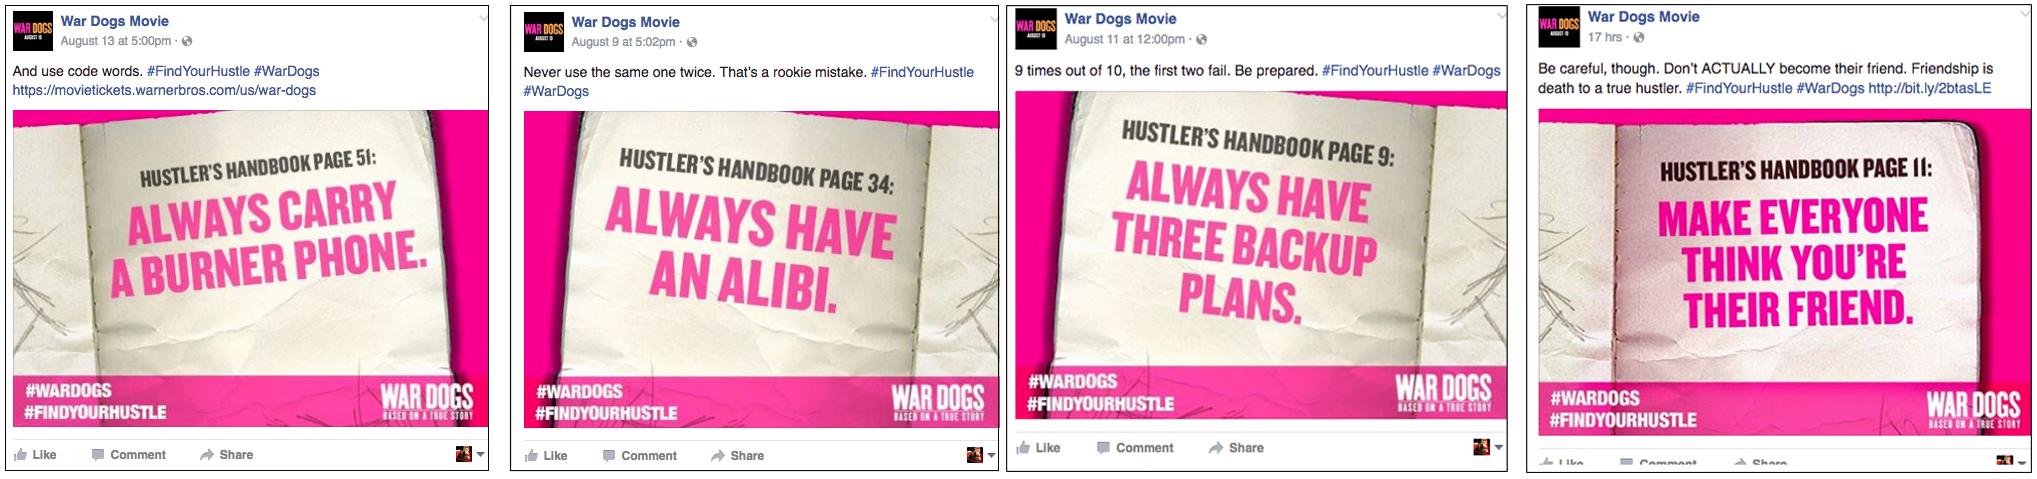 wardogs social banners new layout.jpg